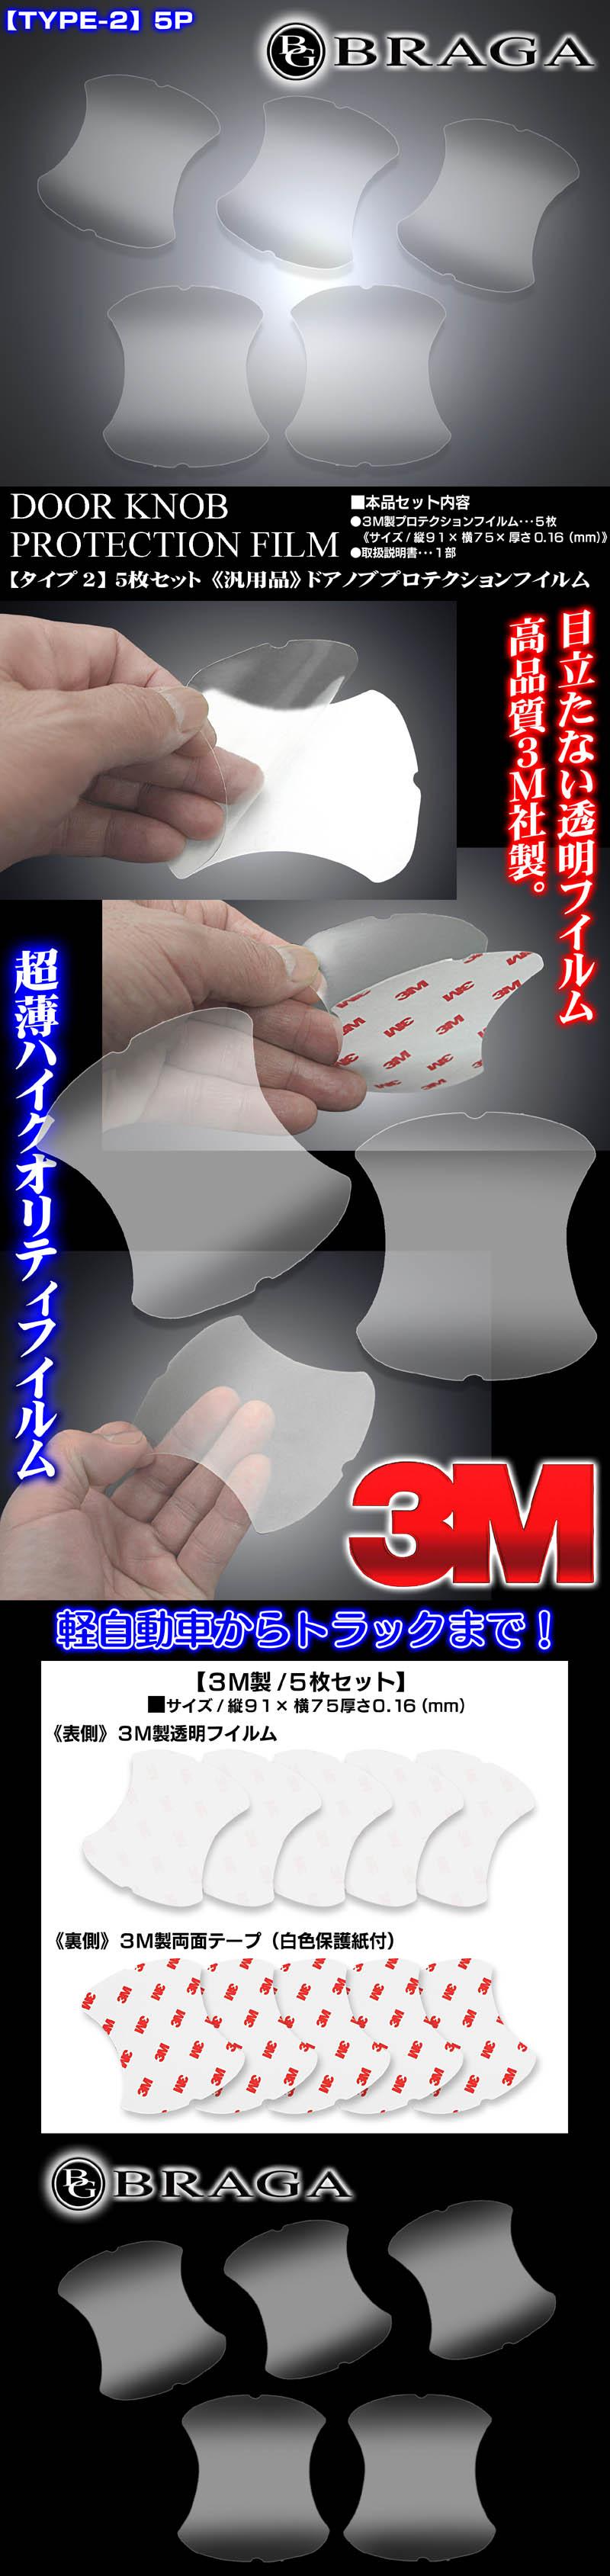 3M製ドアノブ/ハンドル プロテクション フイルム[タイプ2]汎用品/傷防止、保護透明フイルム/5枚セット/ブラガ